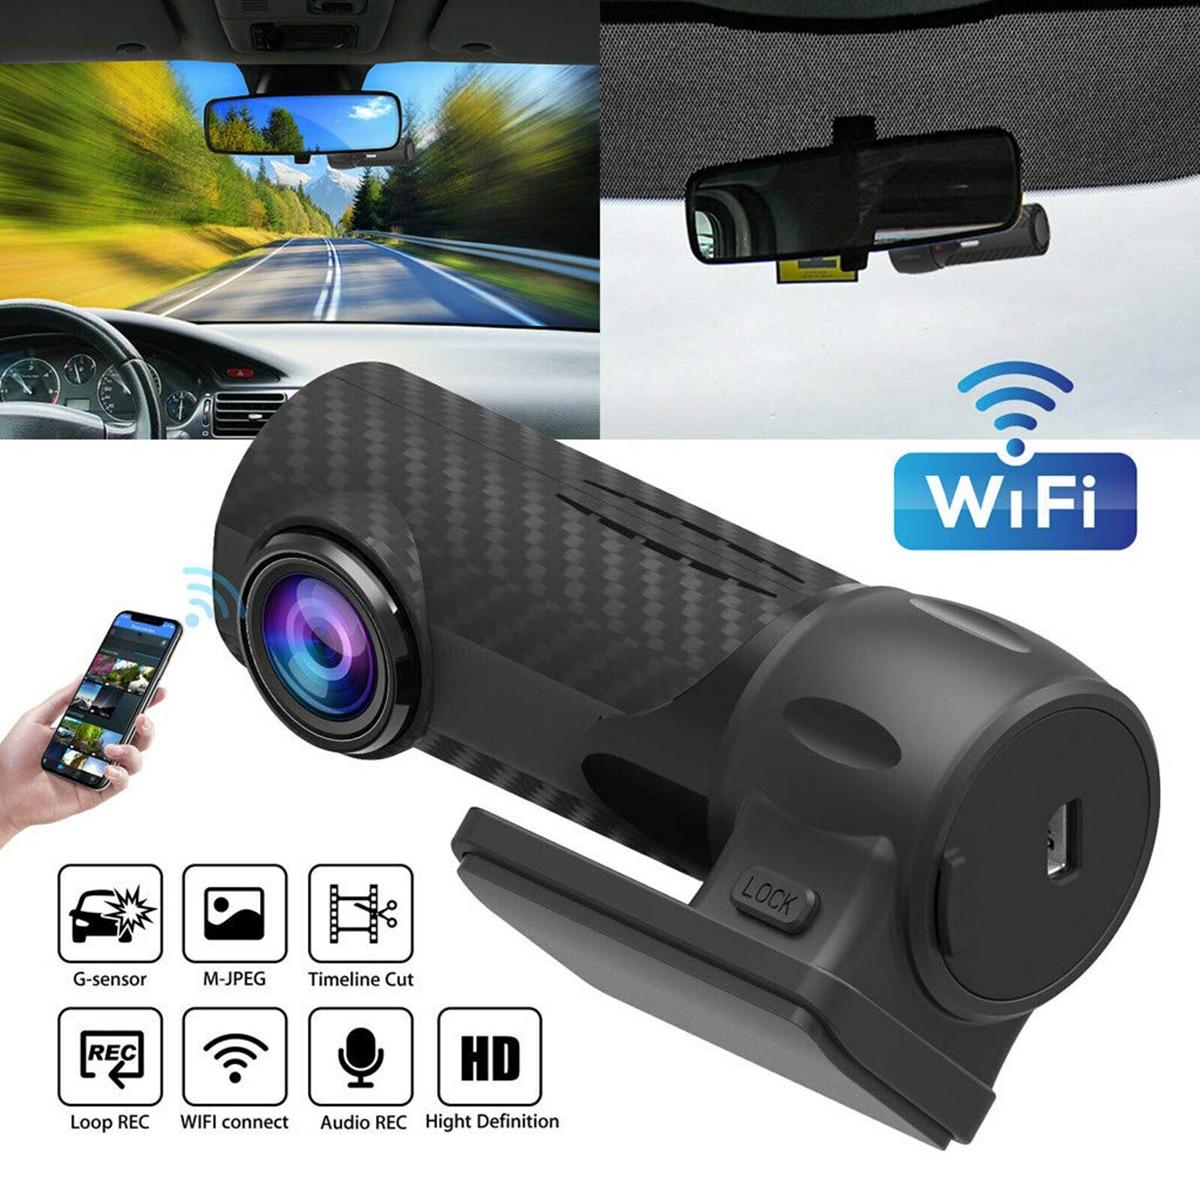 Car DVR Parking-Camera WIFI Mini 170-Degree Super WDR Built-In 6-25V 6G Glass-Lens